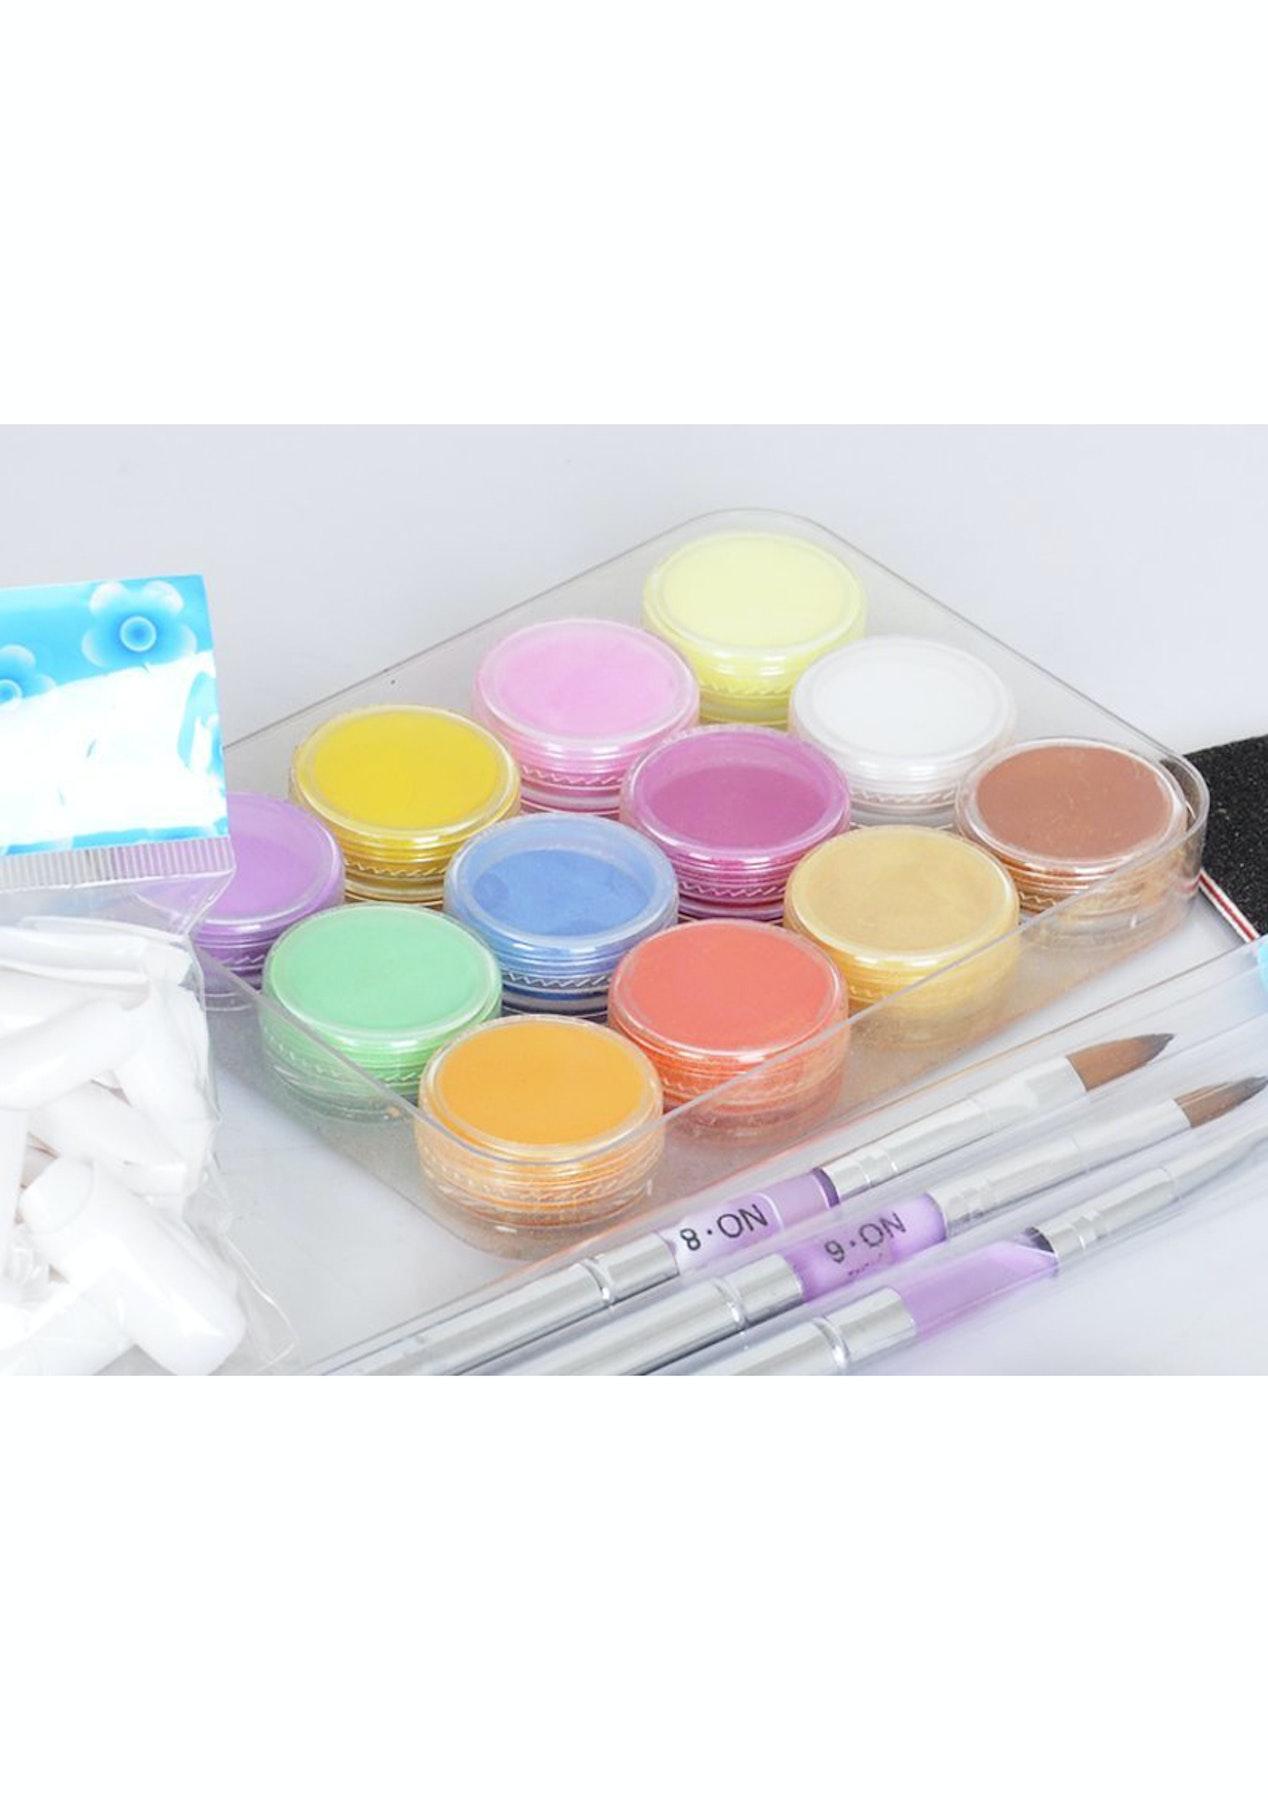 Full Acrylic Powder Nail Kit Set - Pamper Home Spa Day - Onceit